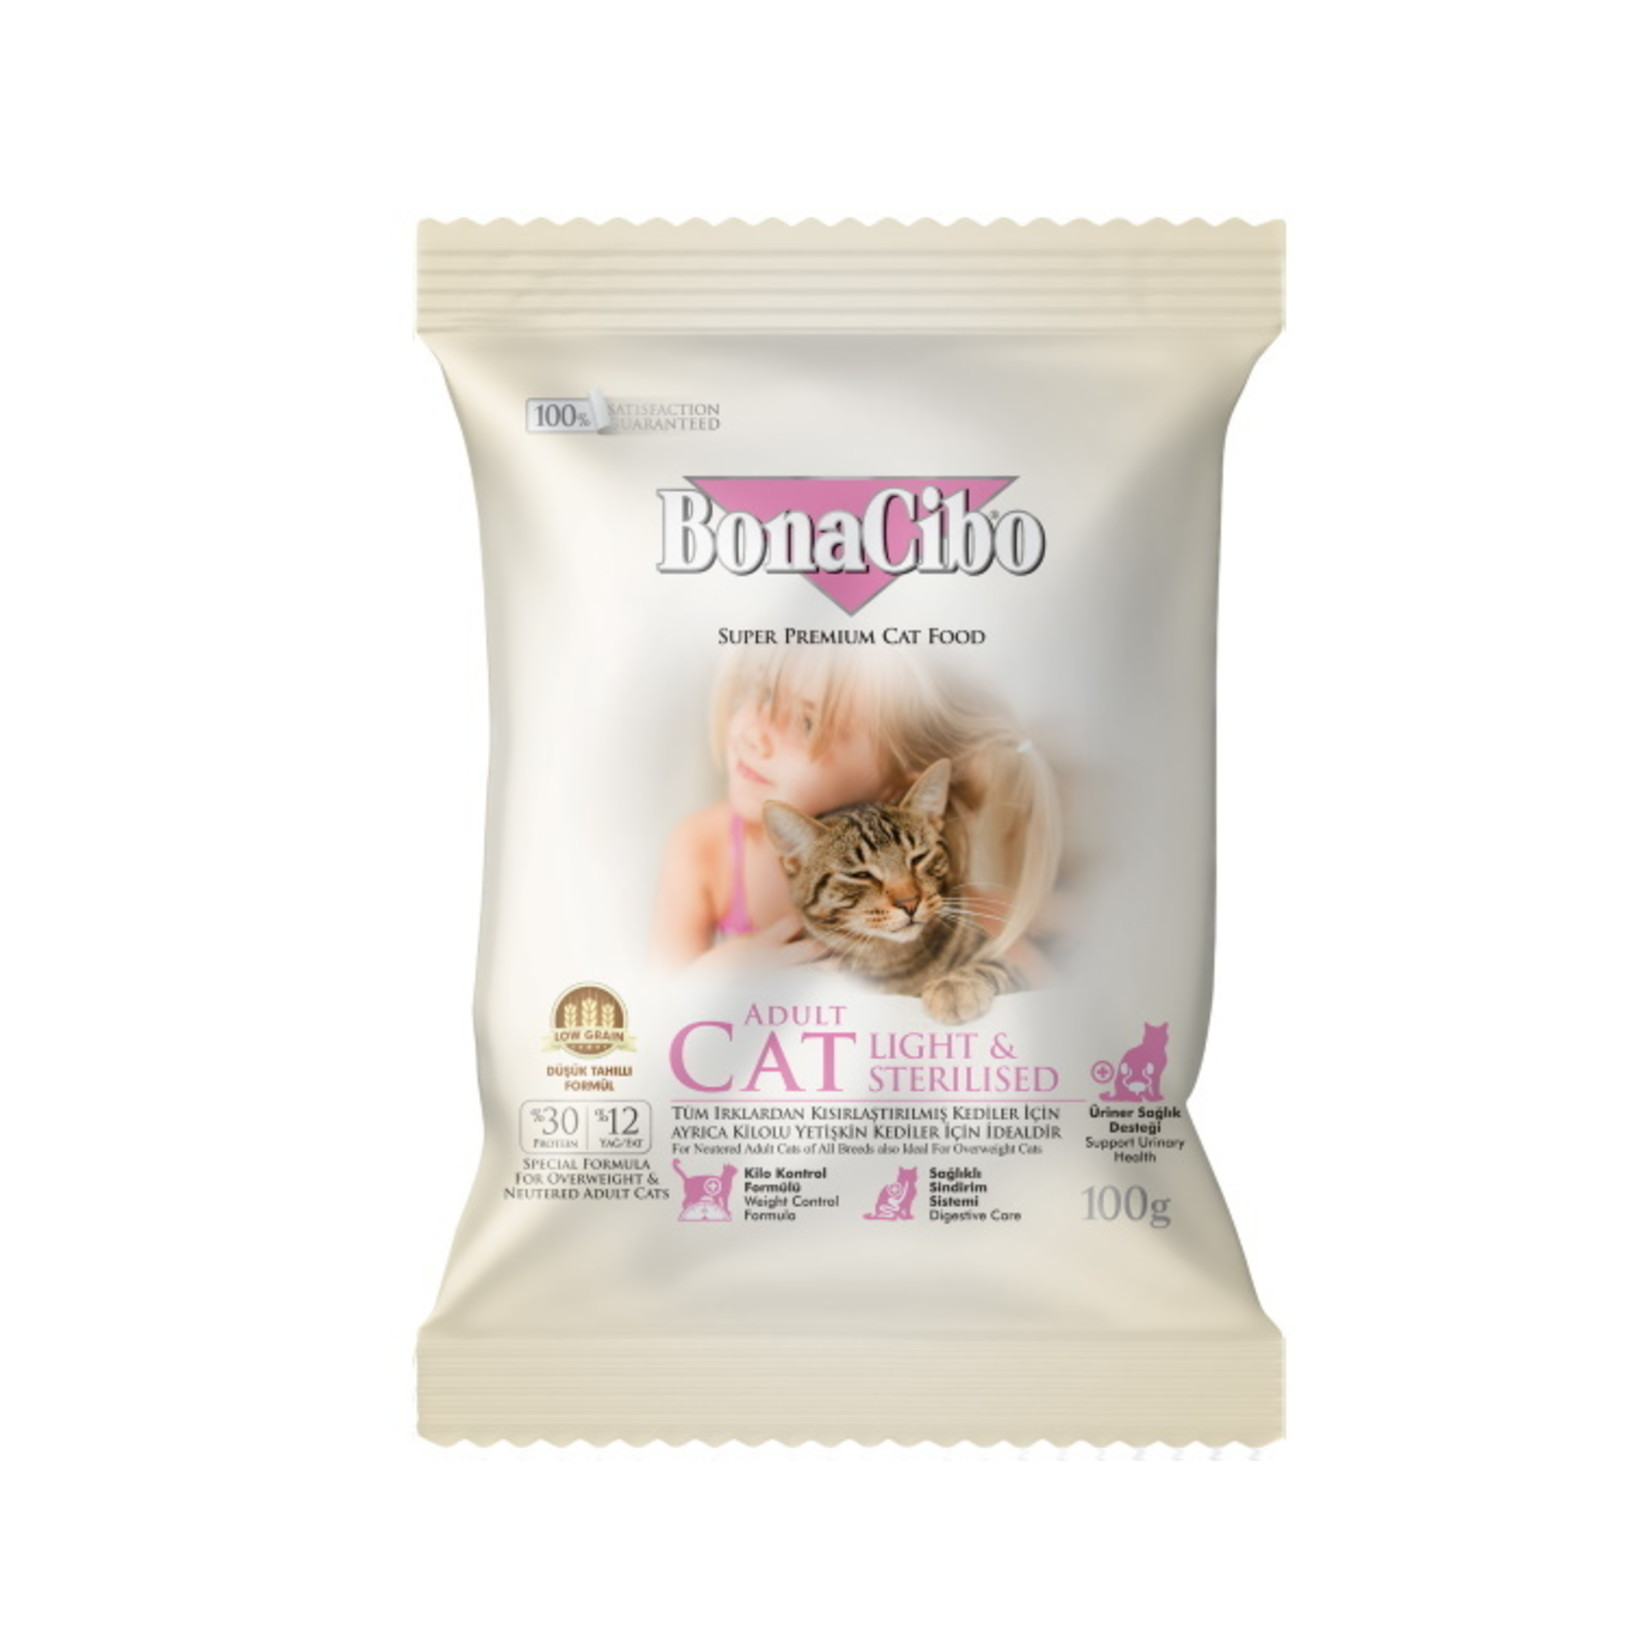 Bonacibo Sample 100 GR |  BonaCibo Adult Cat Light & Sterilised